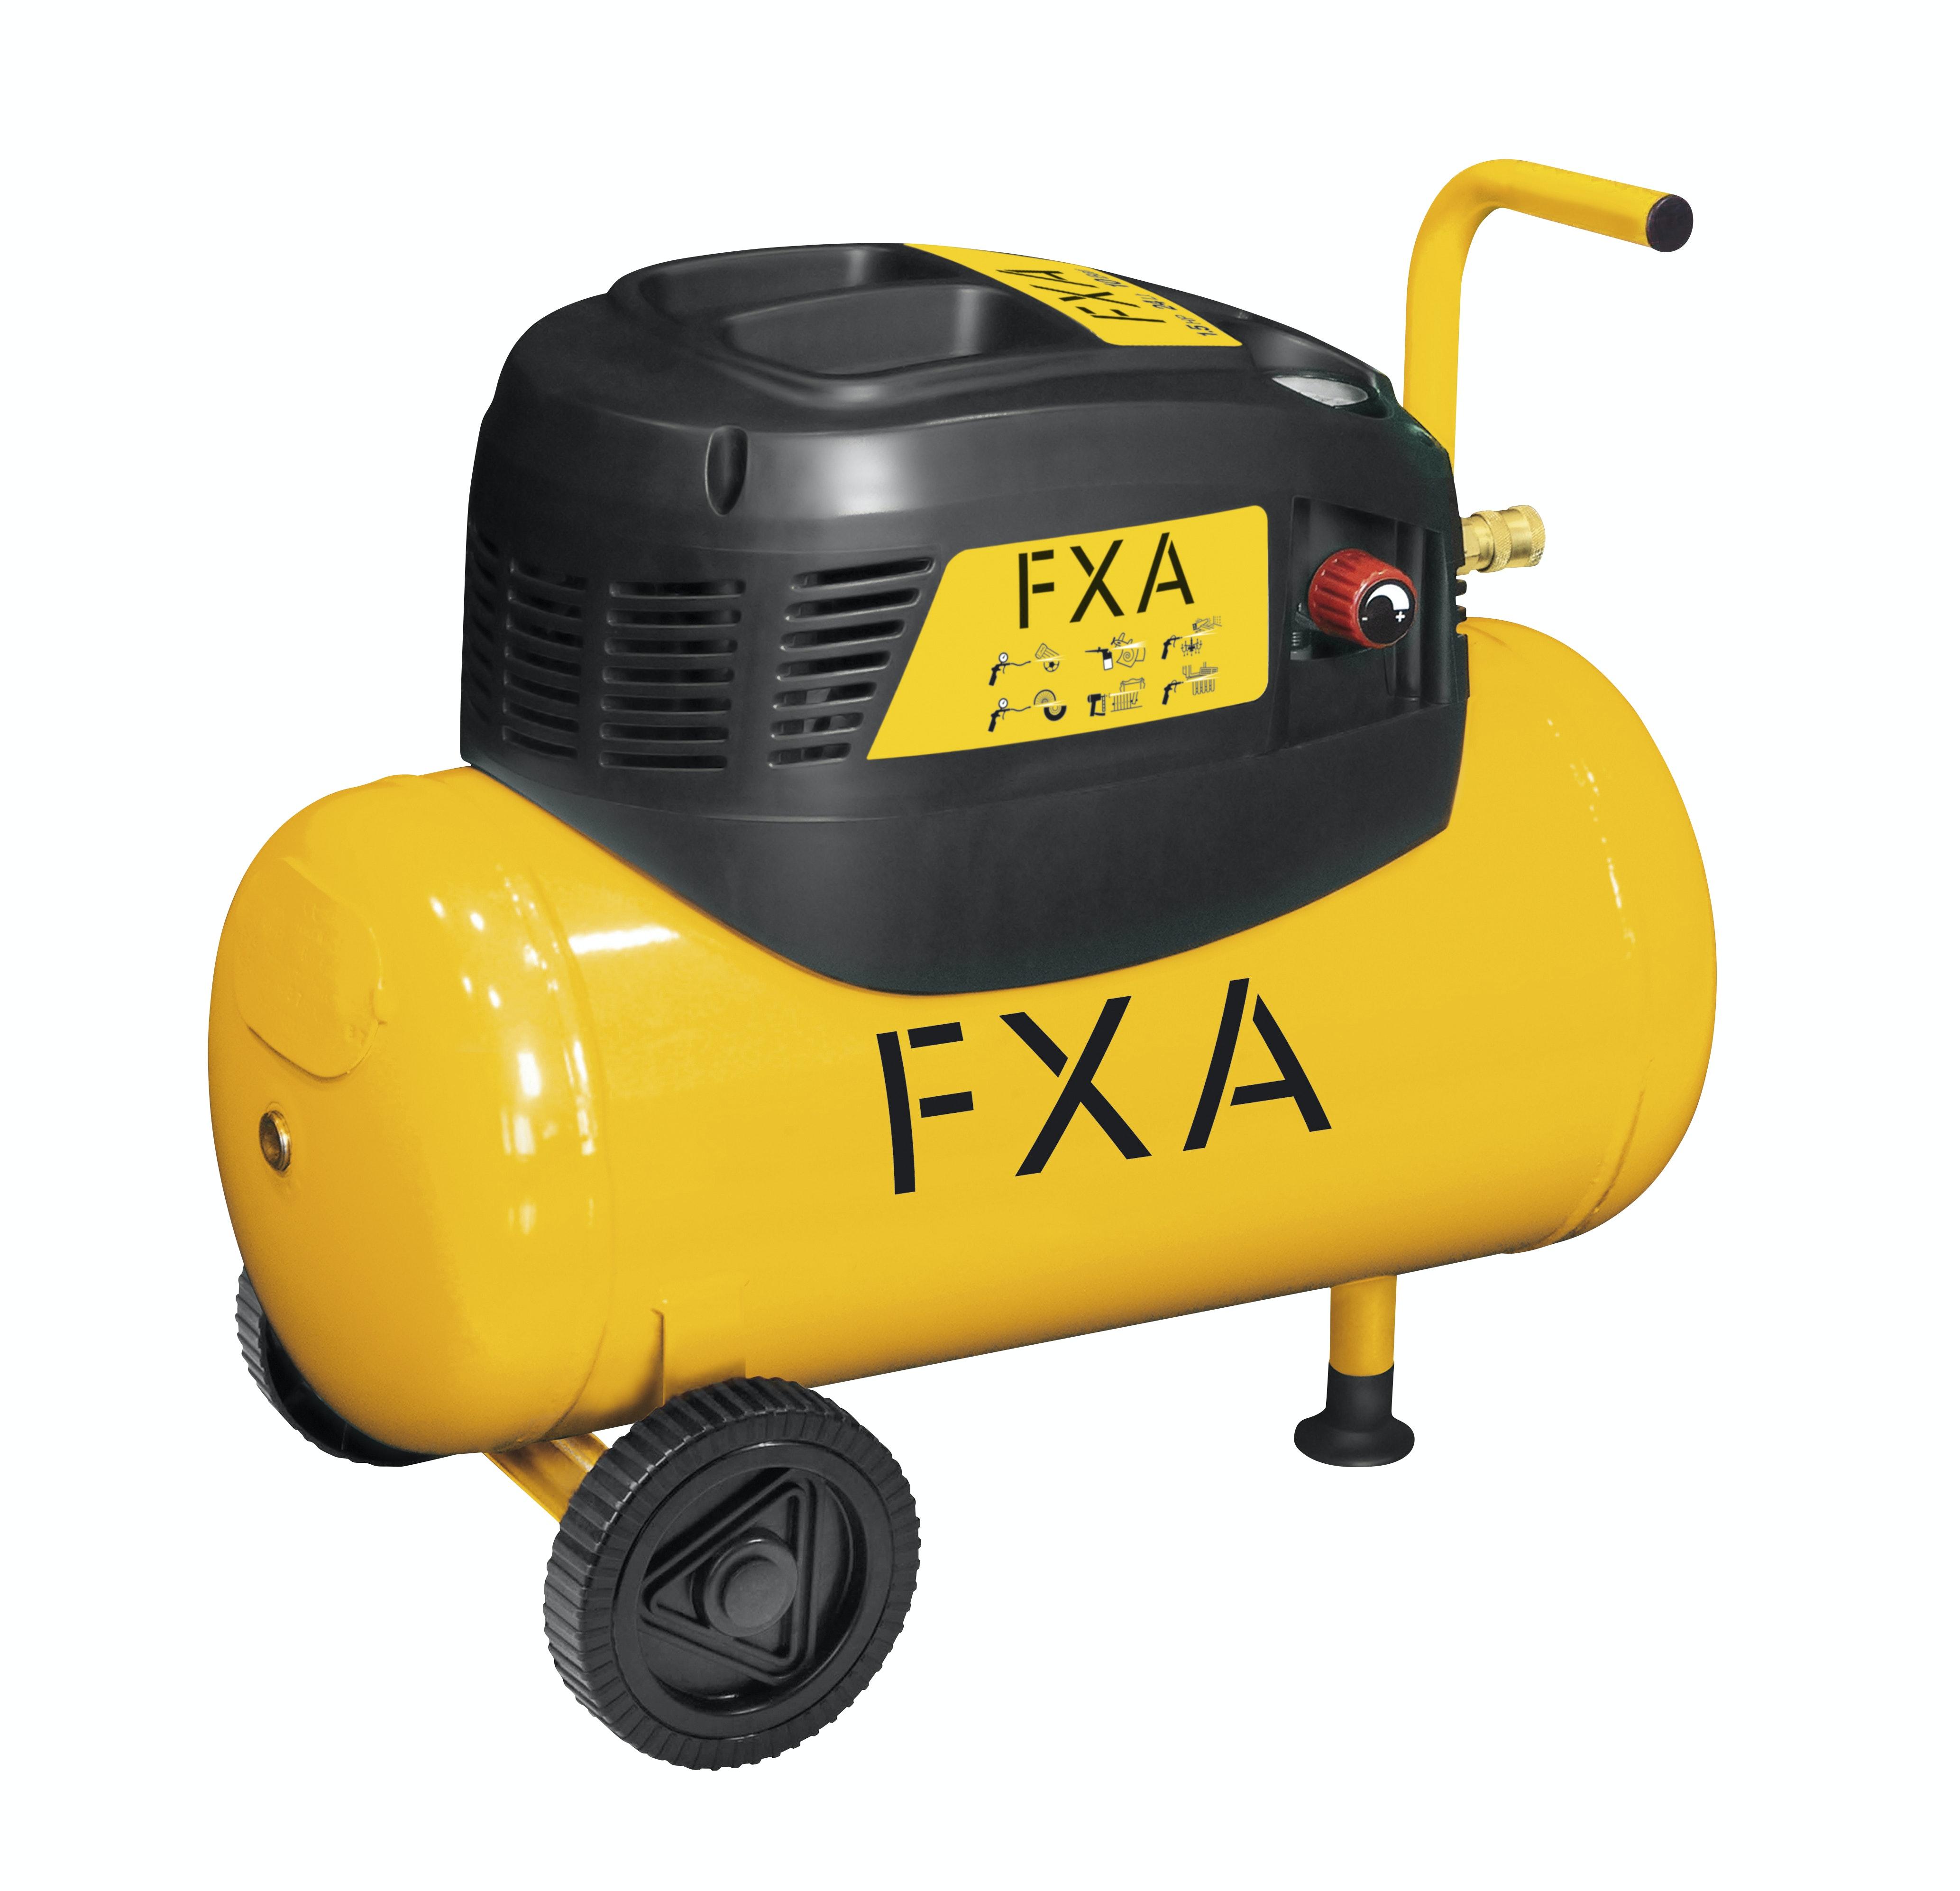 Kompressor FXA Bc10 1,1kw